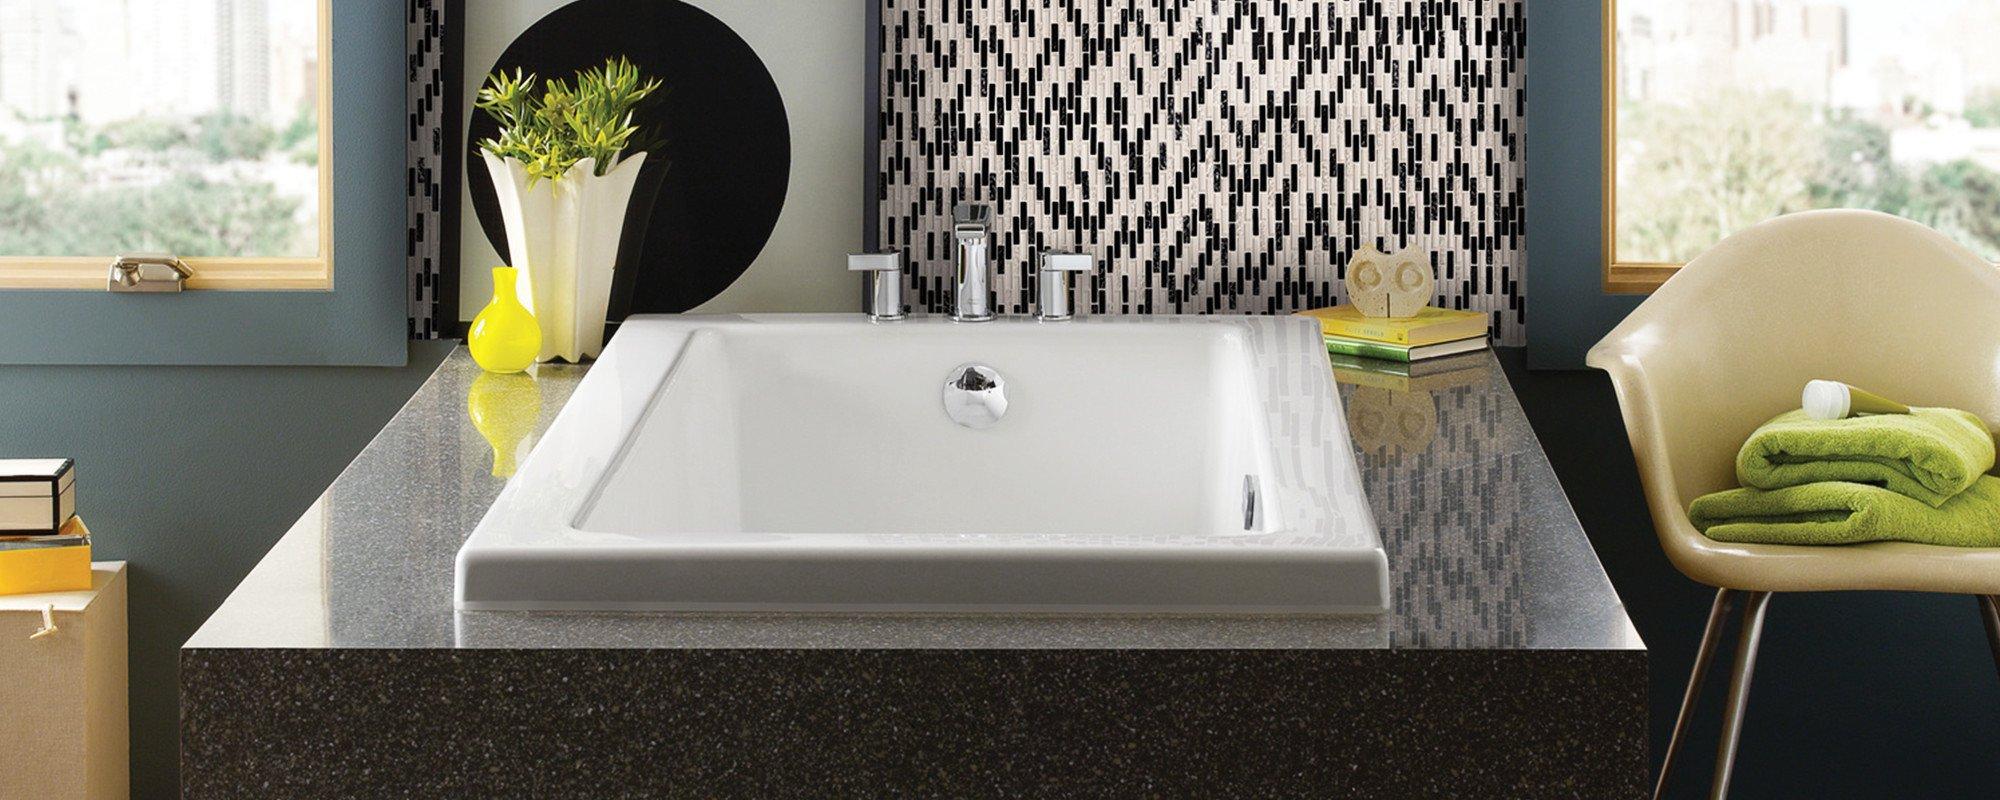 Orange County Interior Design | Tile Elements